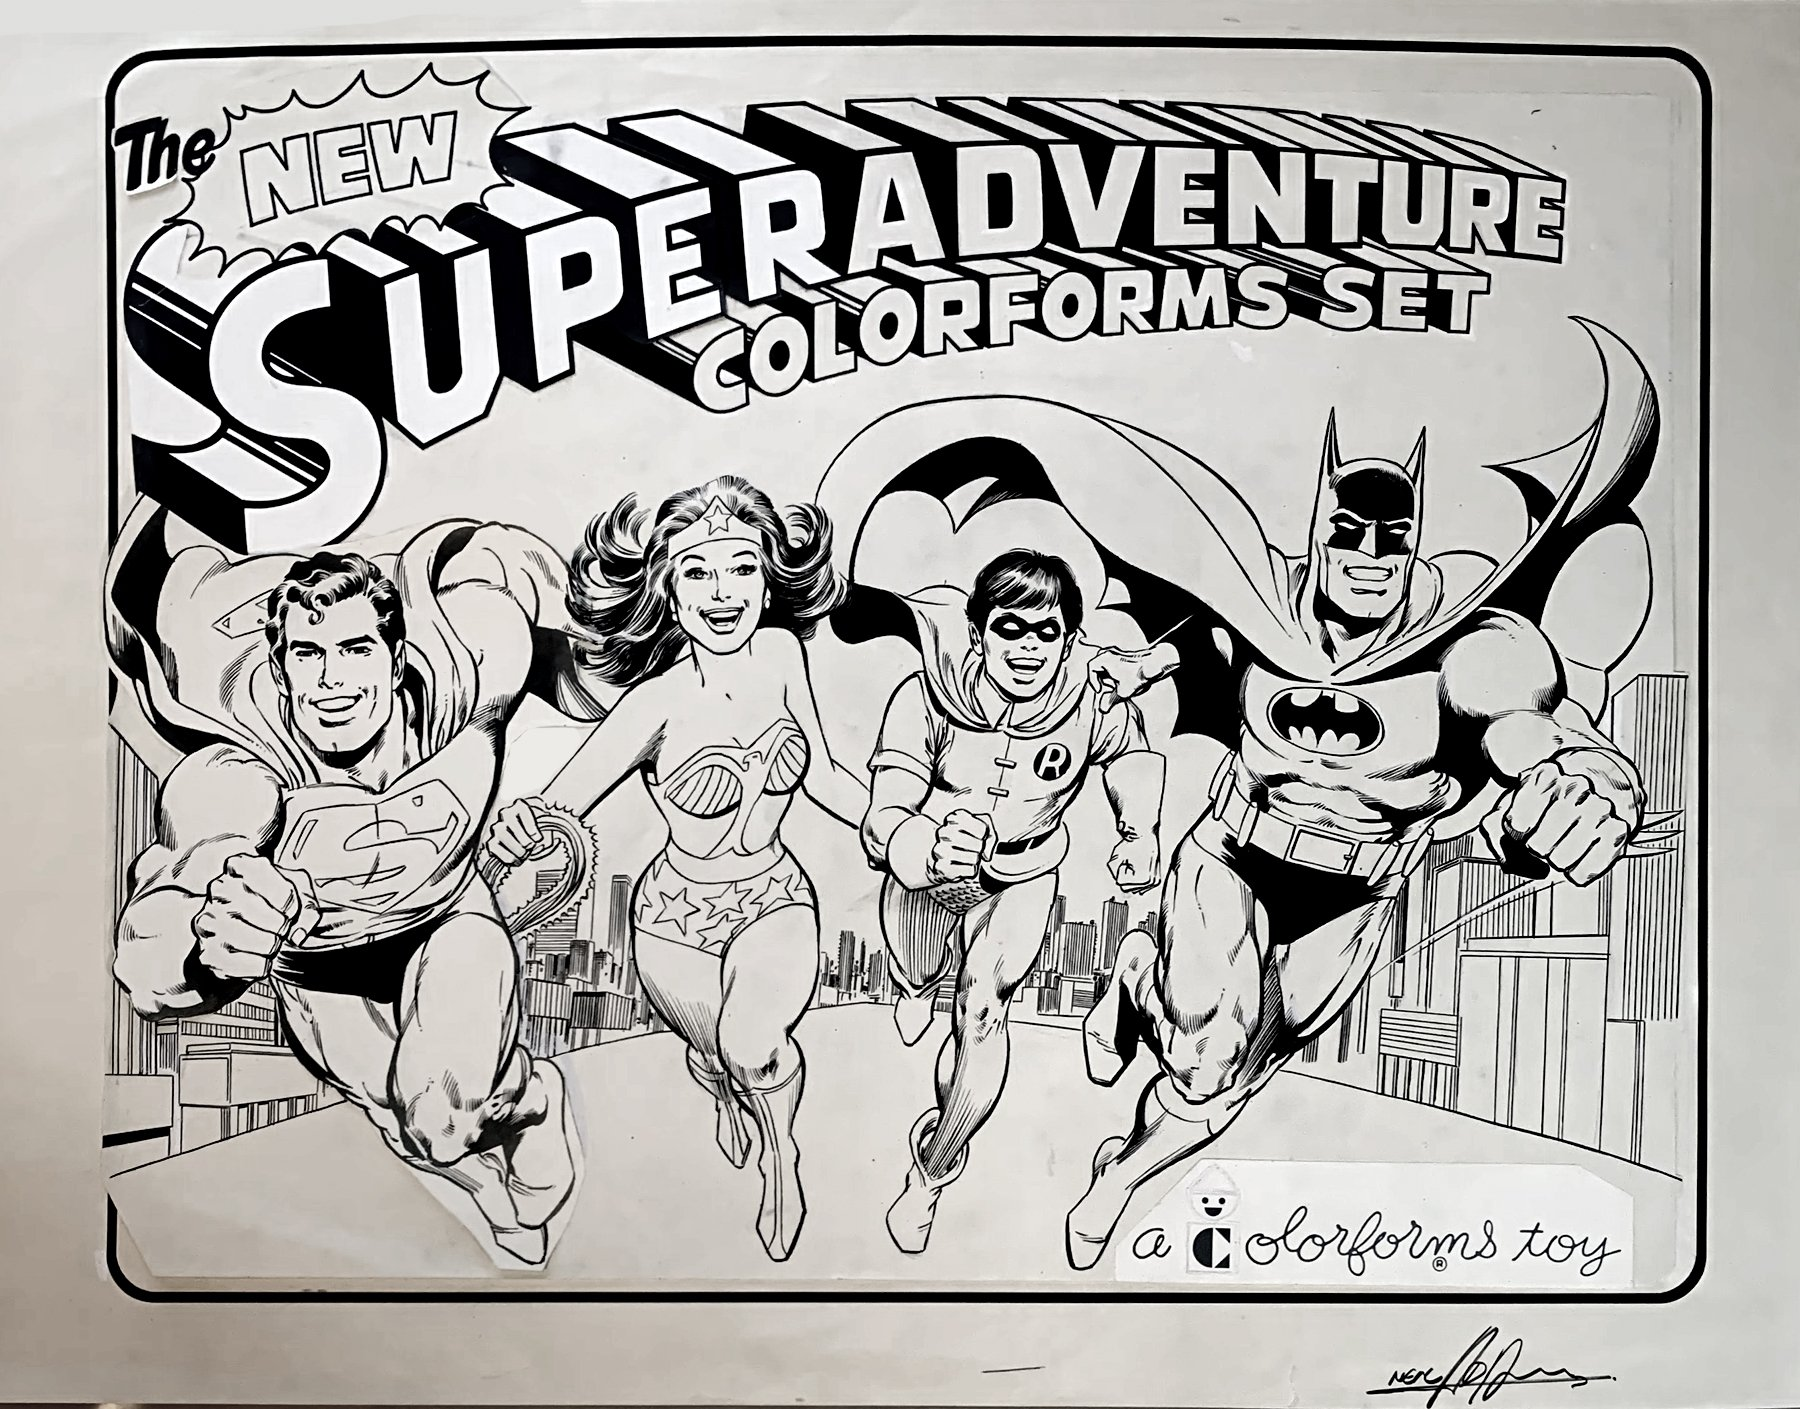 SUPERHEROES ADVENTURE SET, HUGE PUBLISHED COVER ART (BATMAN, SUPERMAN, WONDER WOMAN, ROBIN!) 1970s